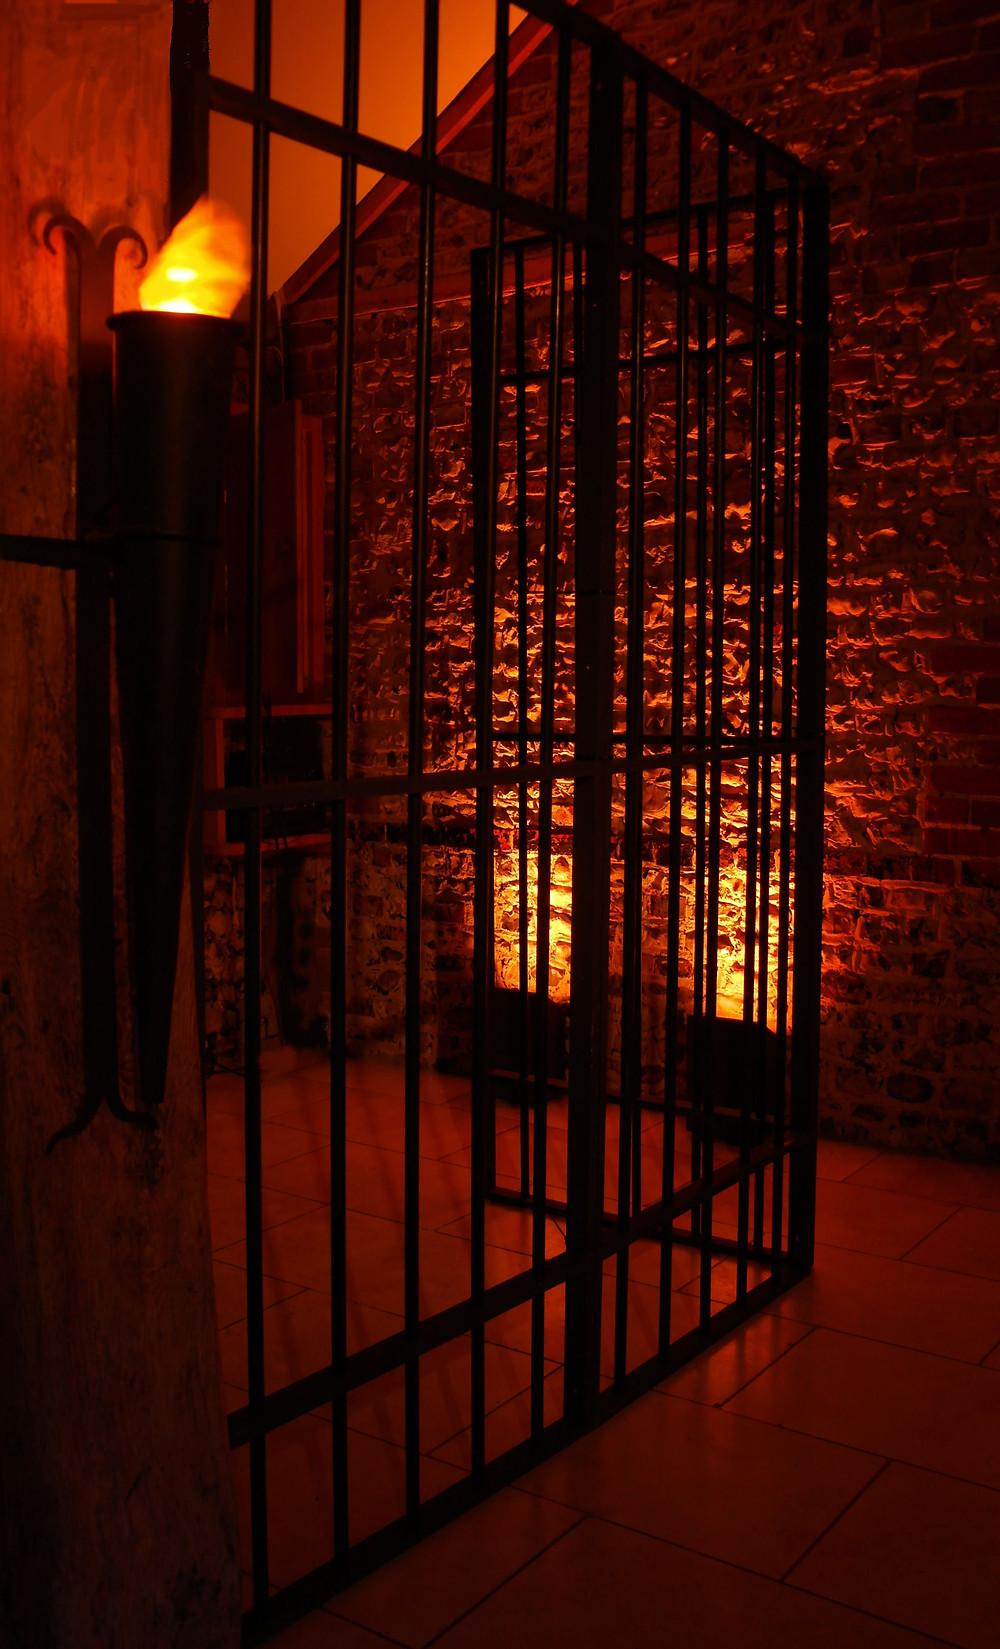 County Jail Wild West set piece